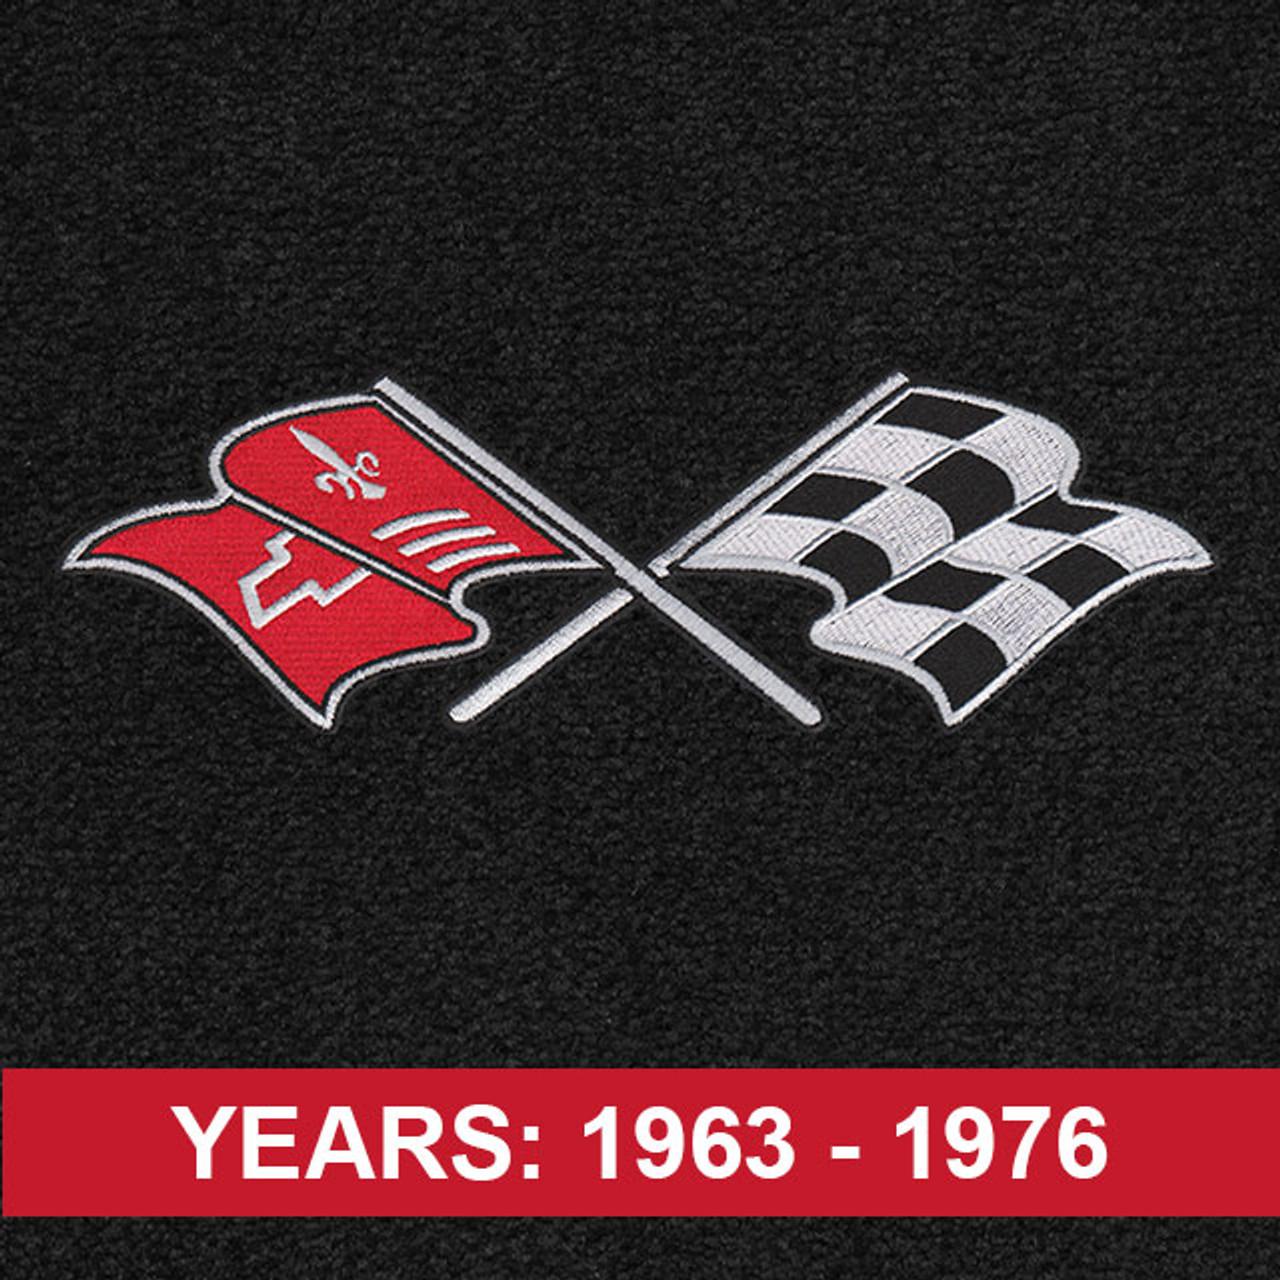 1968-1976 Cross Flags